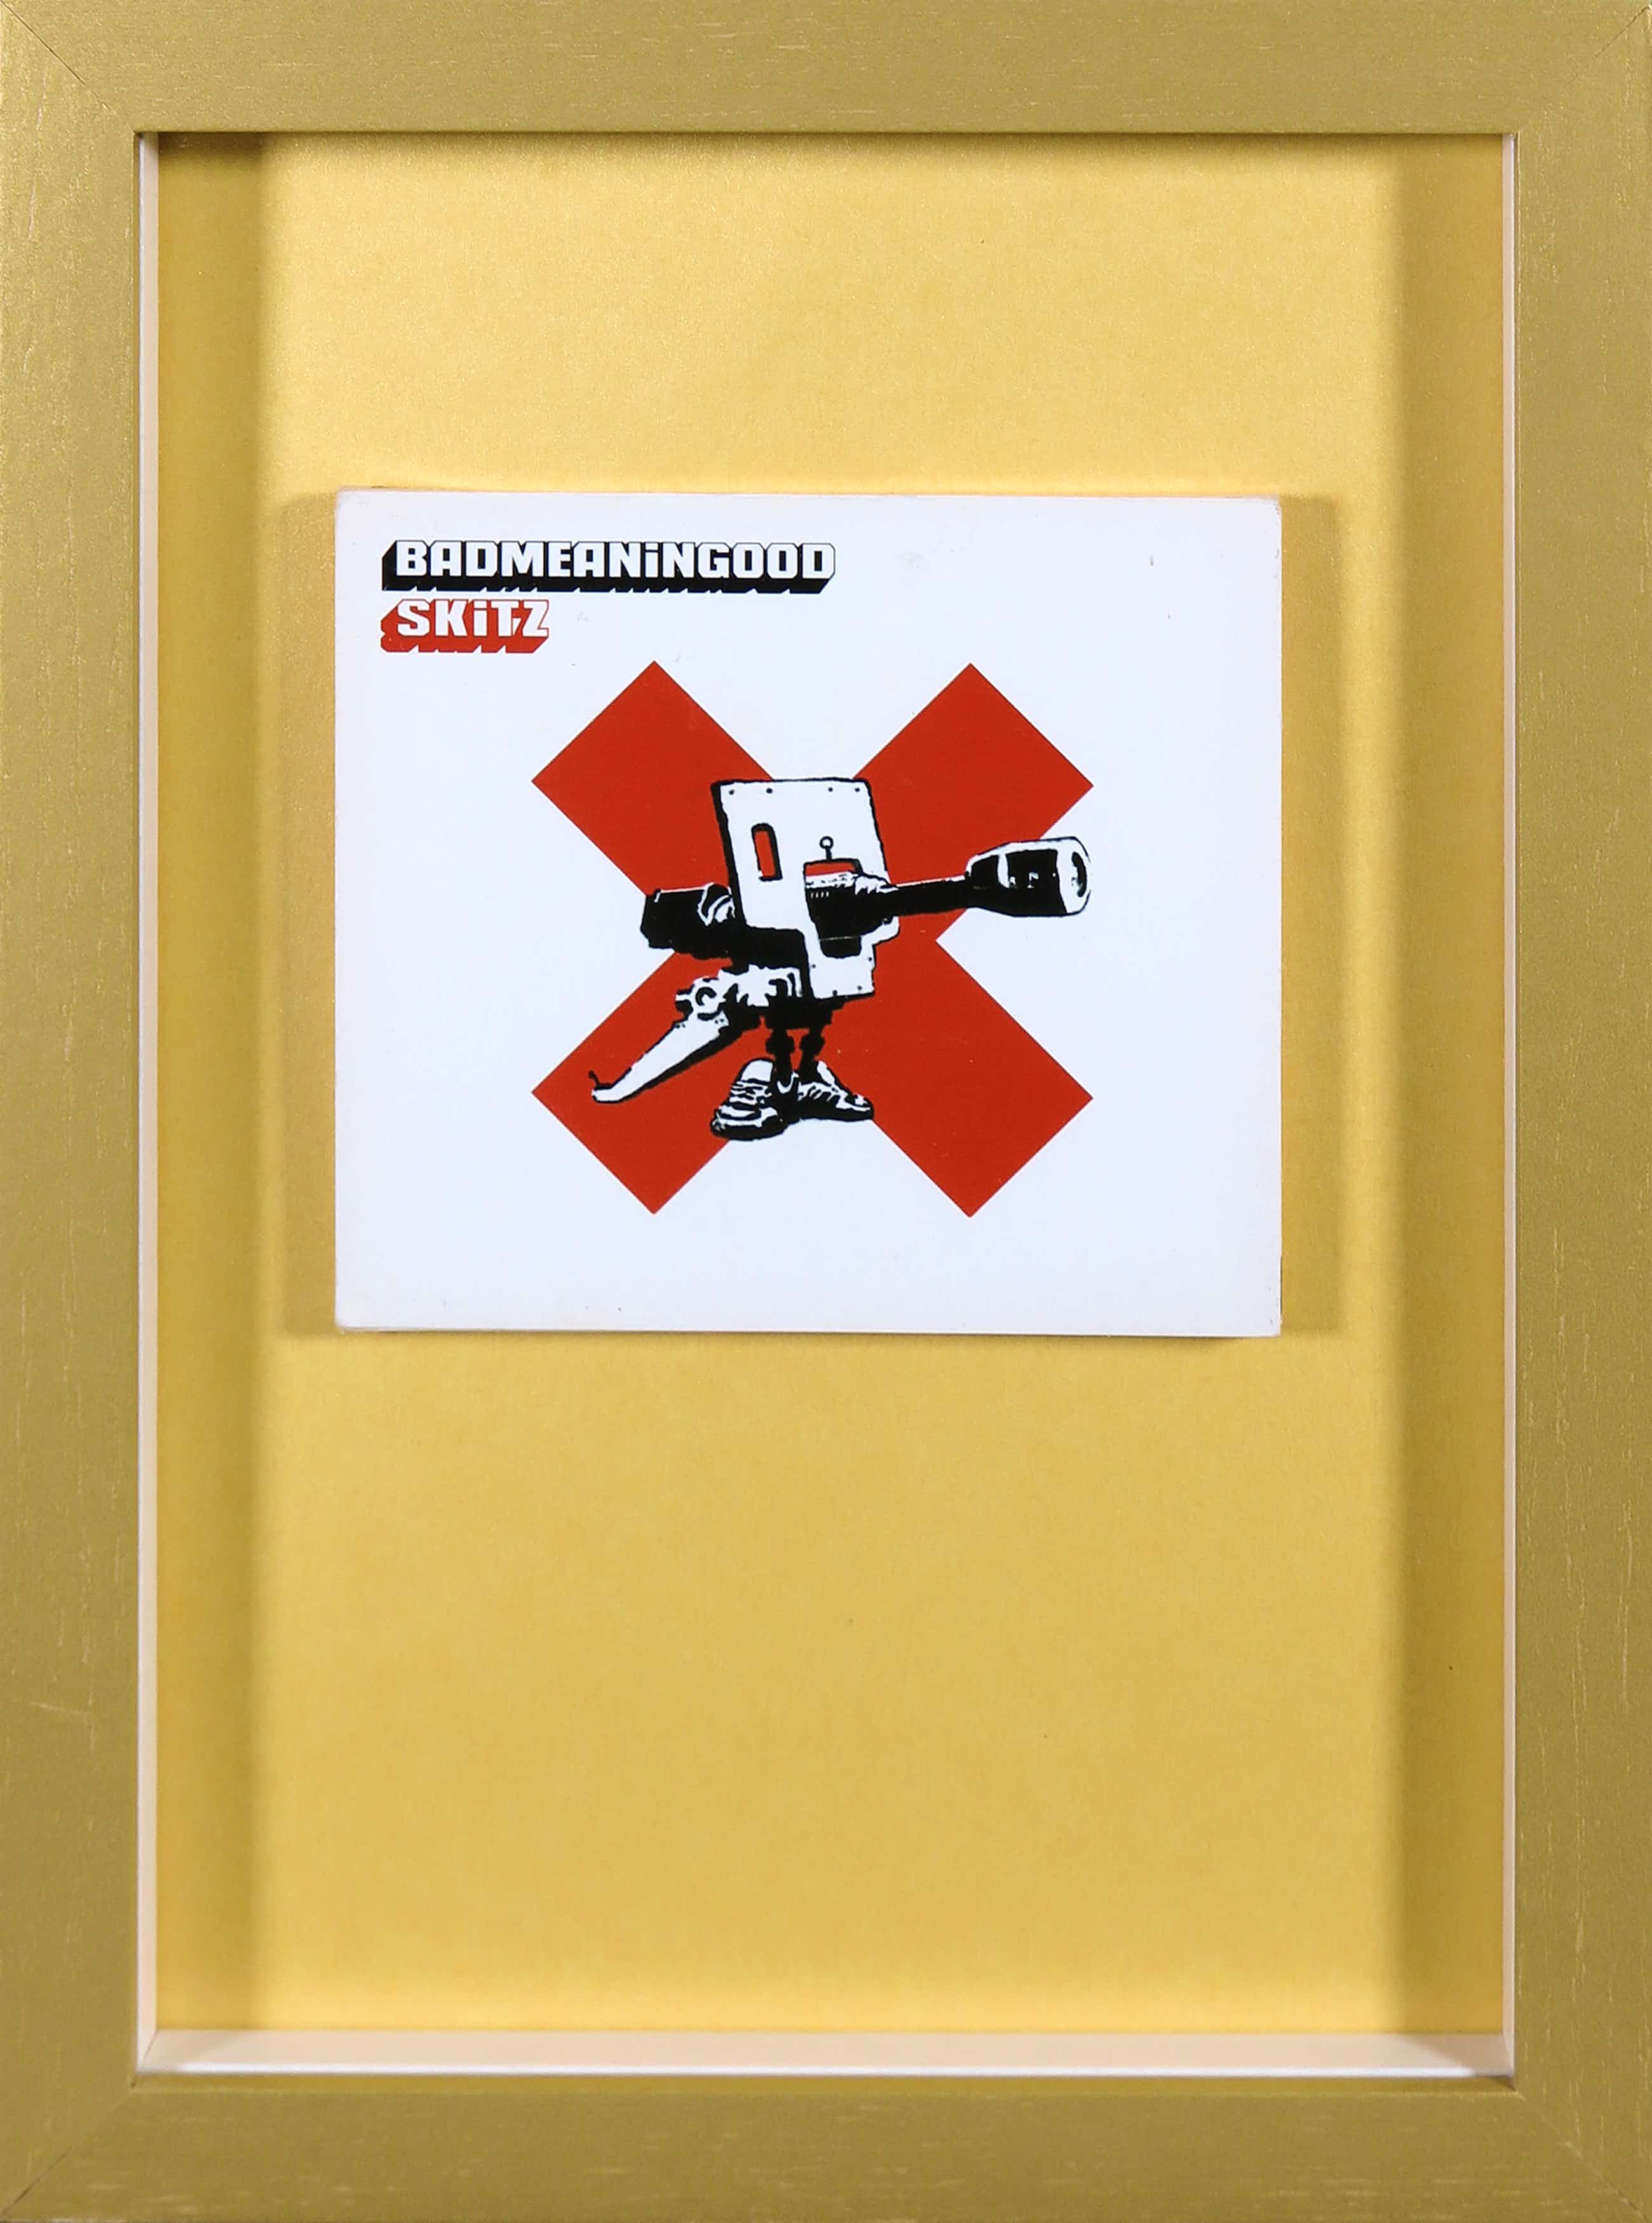 Banksy - Skitz - Badmeaninggood Vol. 1 (CD) kopen? Bied vanaf 90!